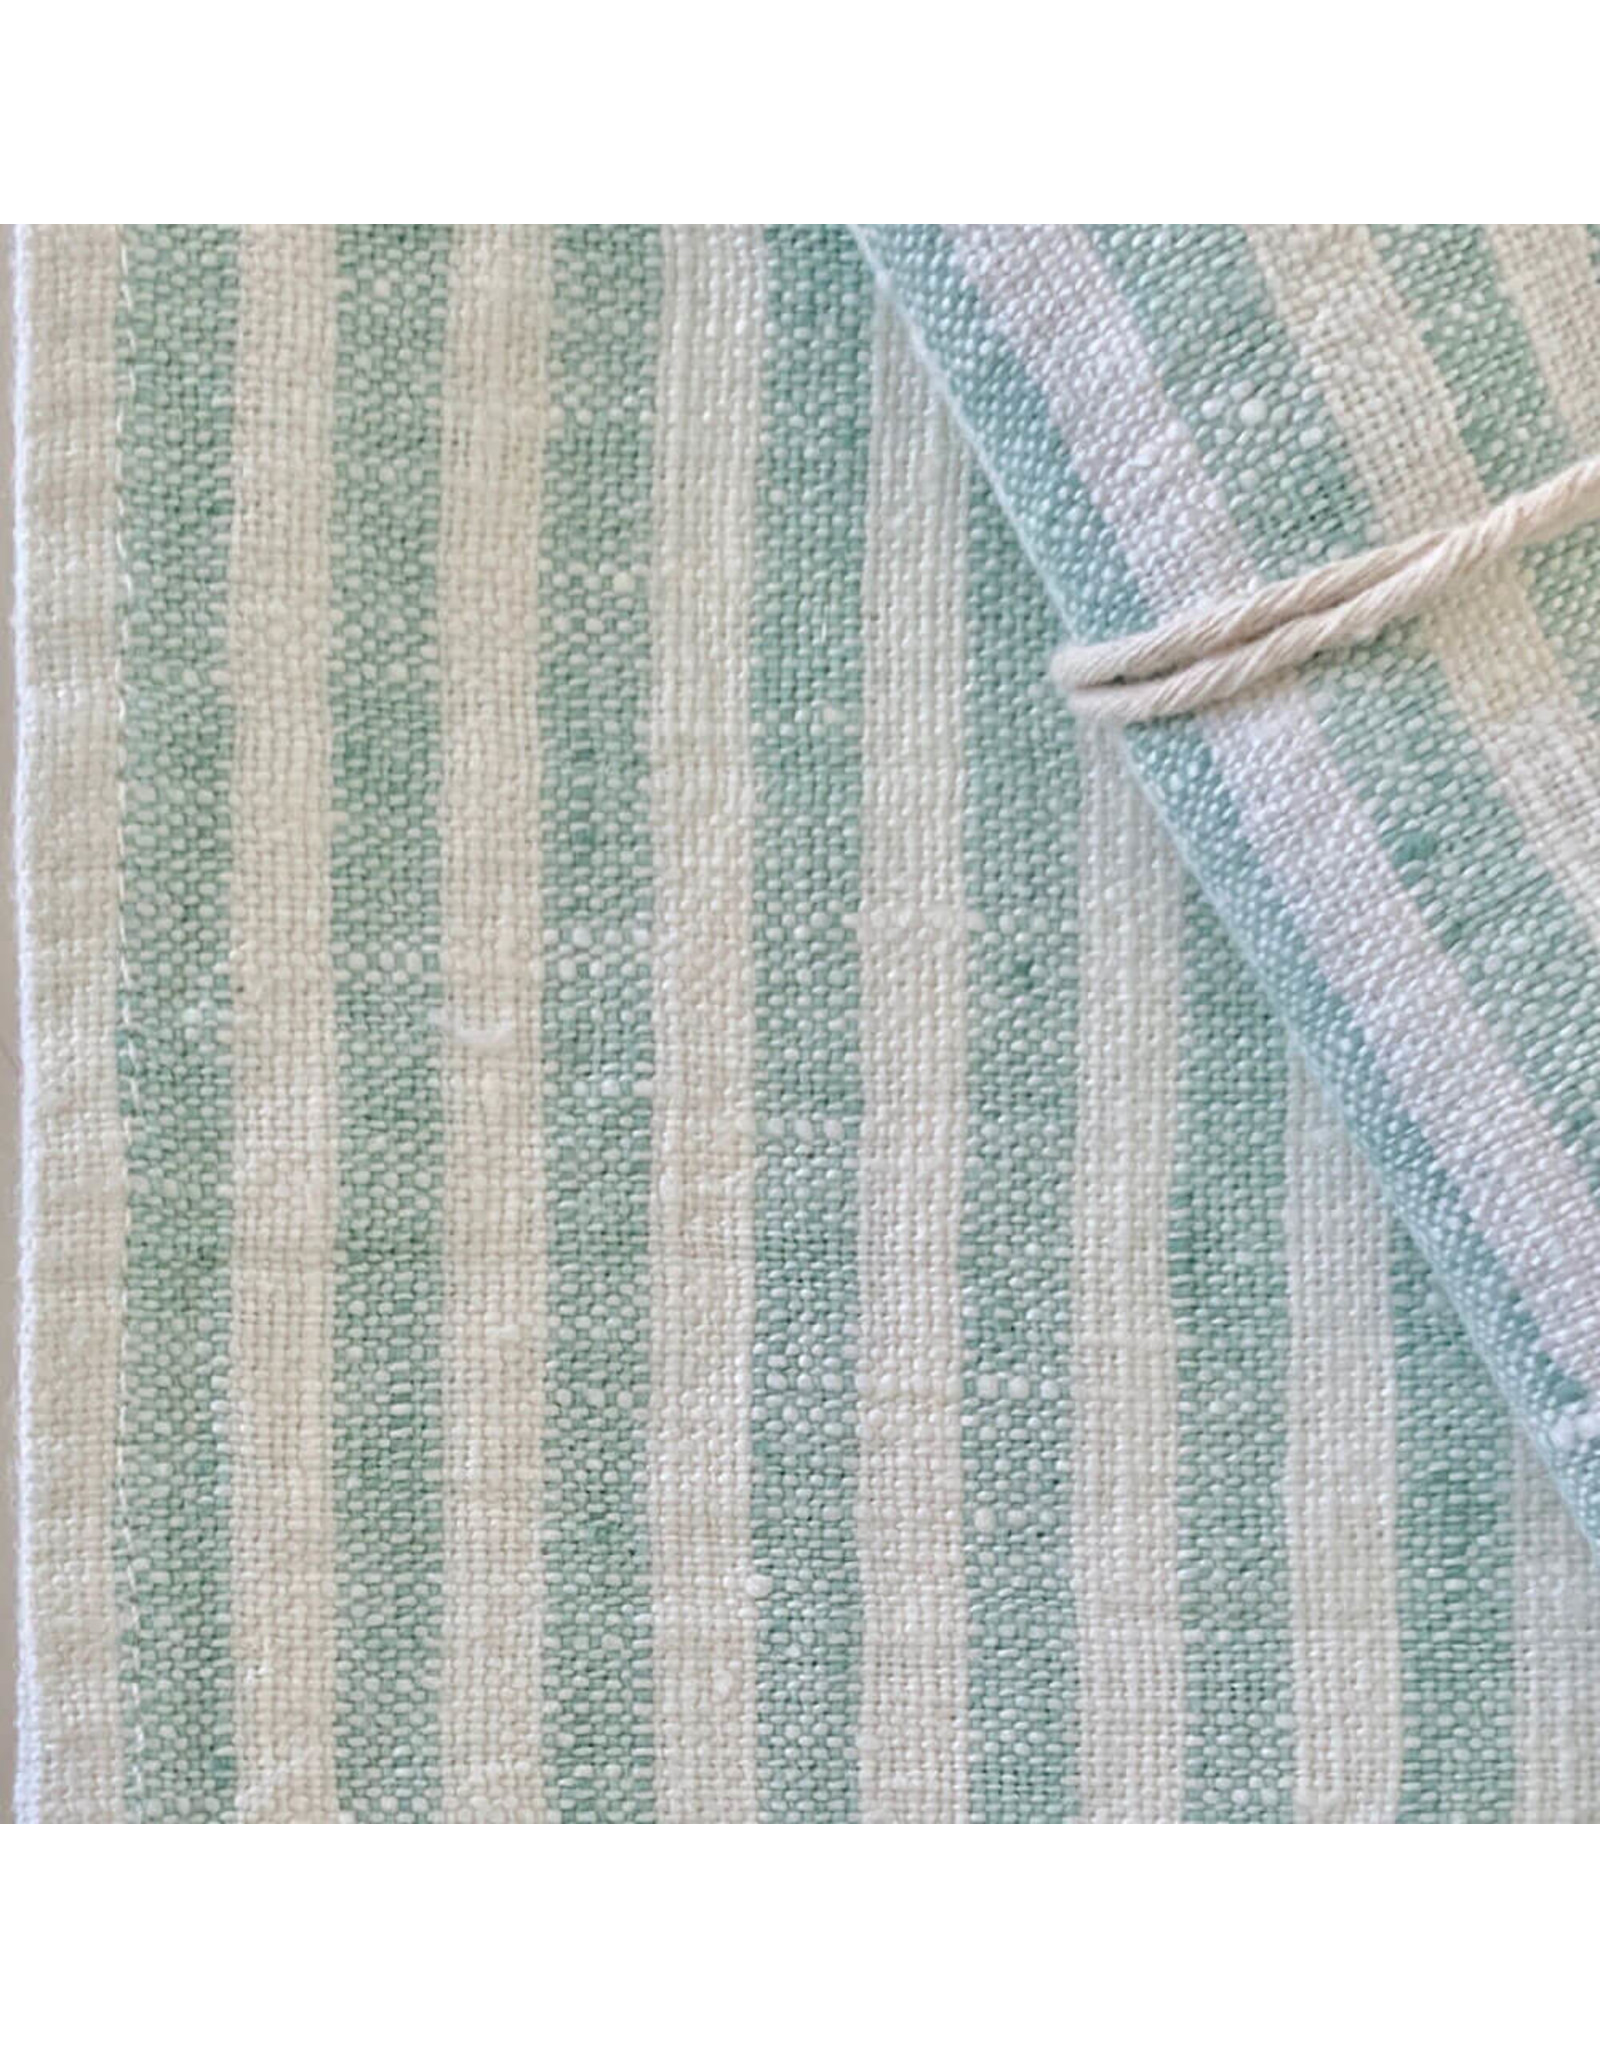 linenme linen napkins set of 4